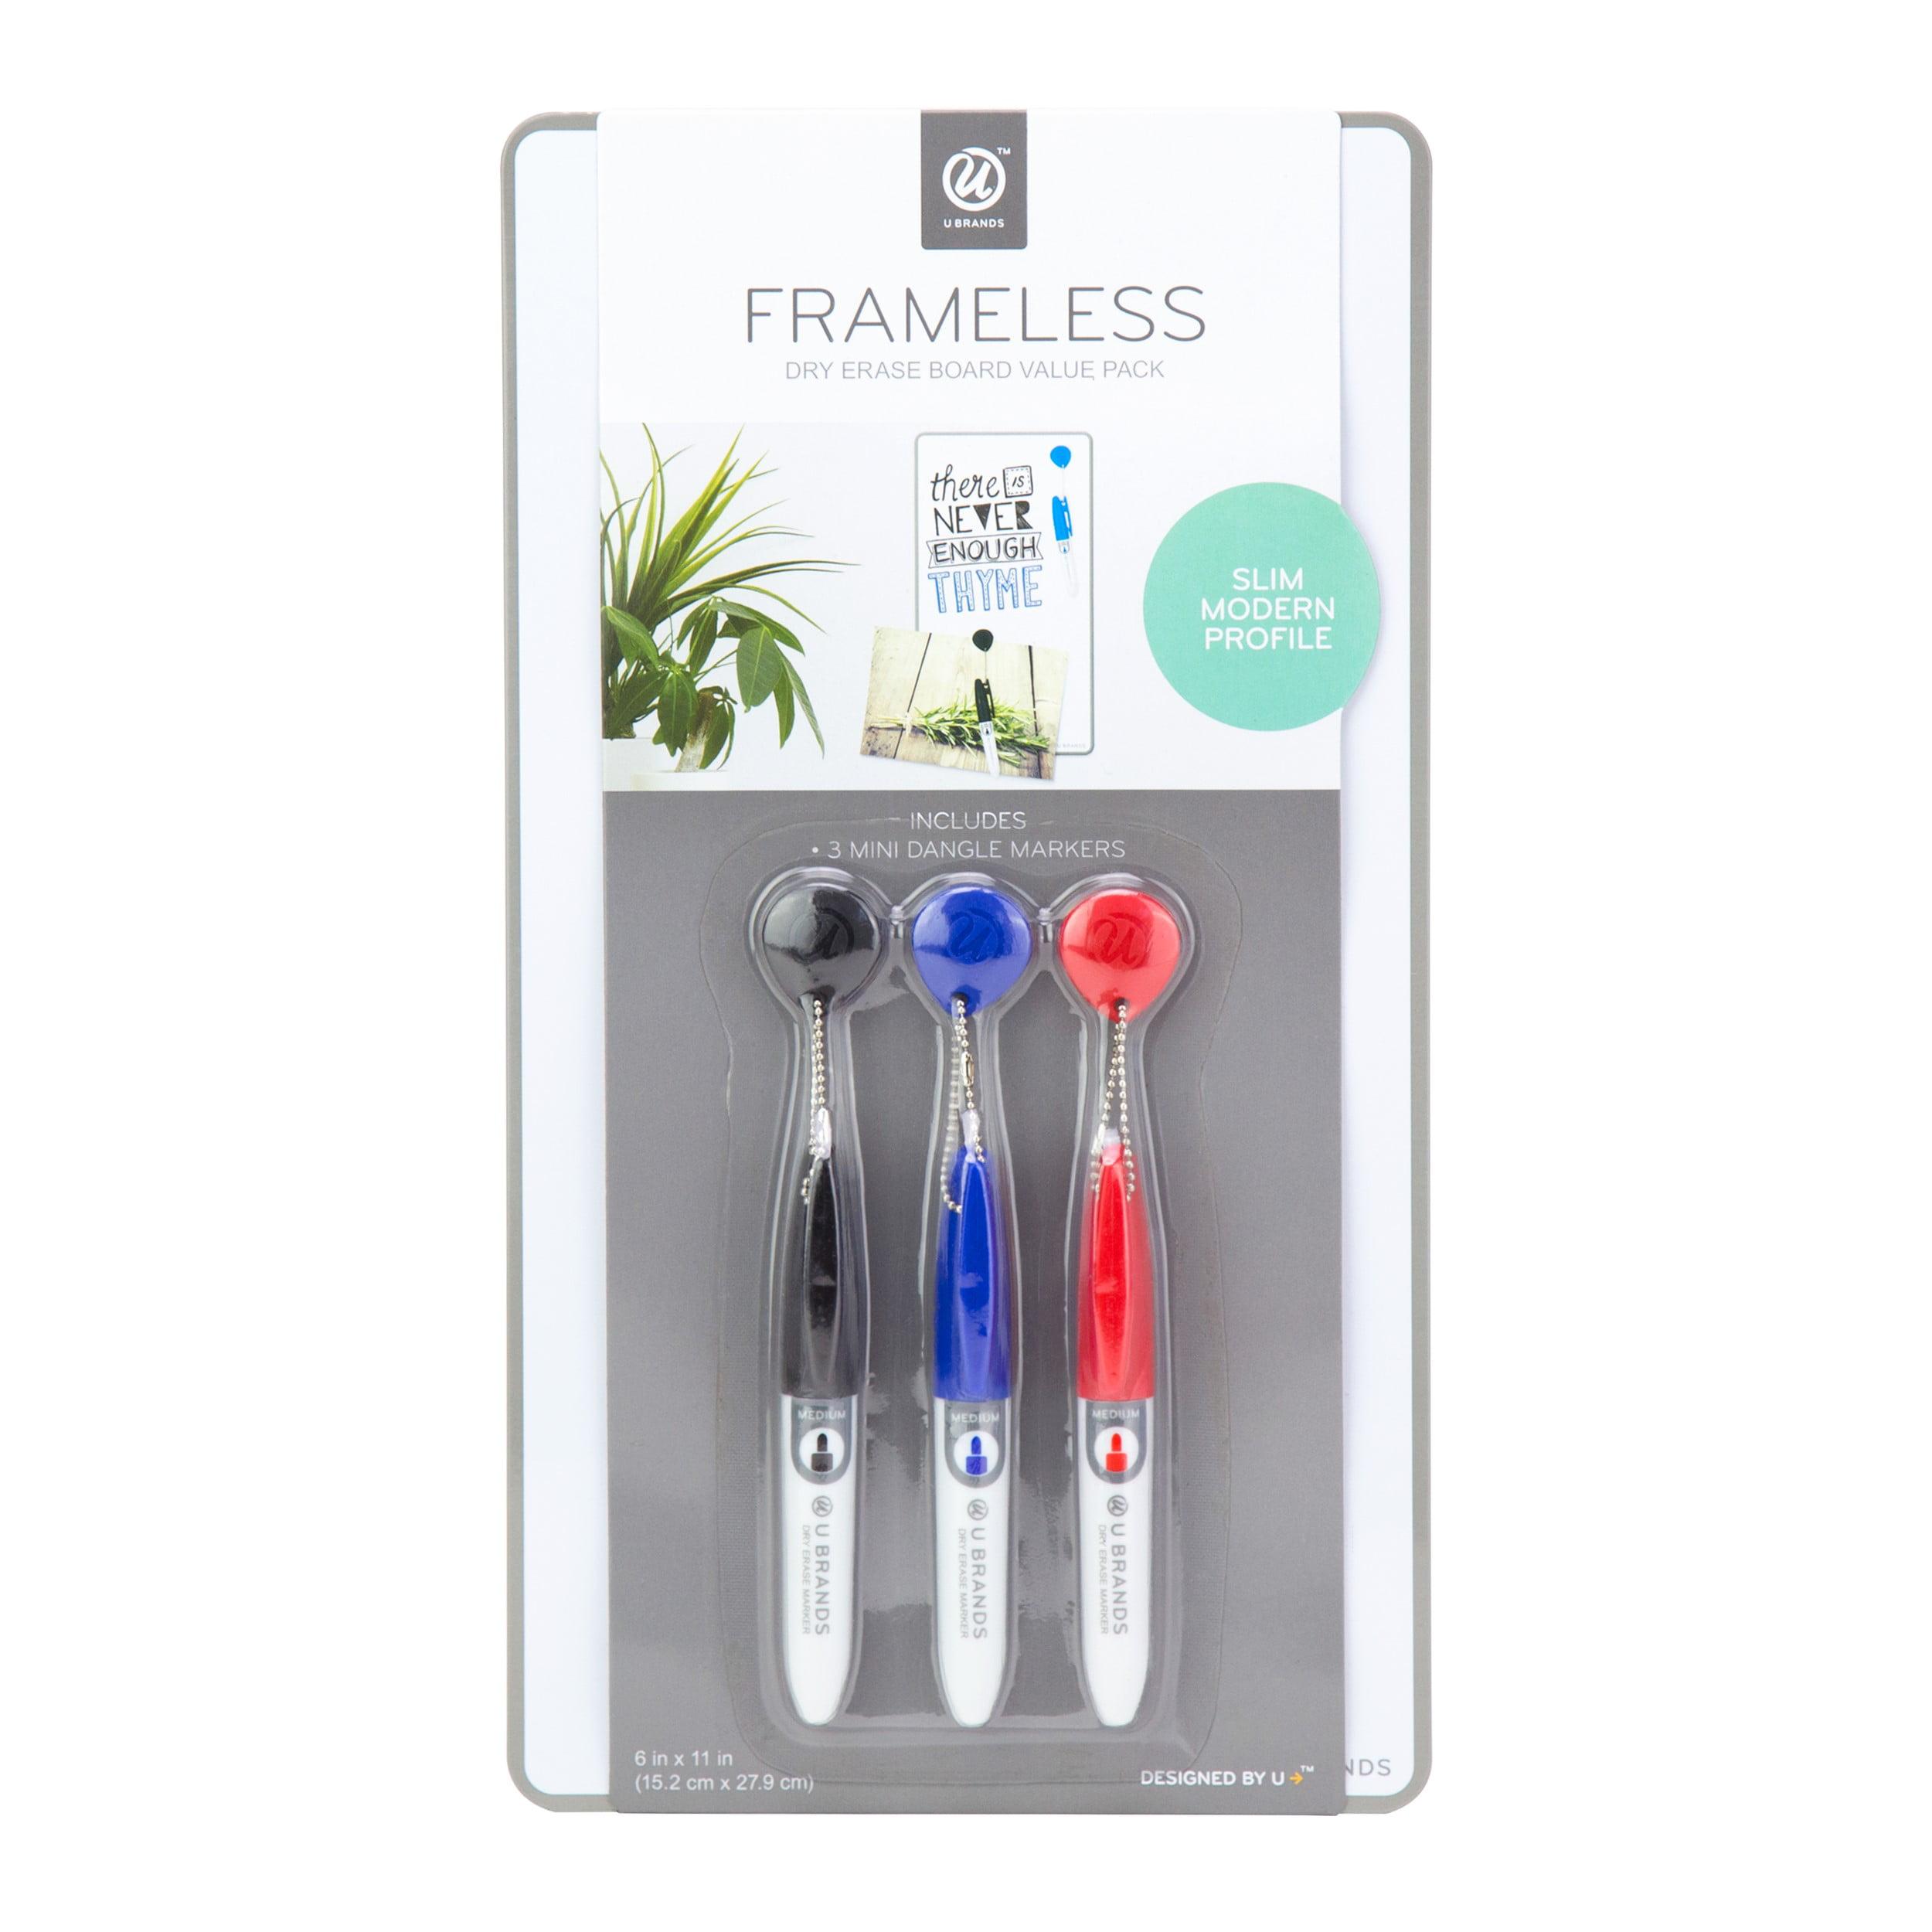 U Brands Magnetic Frameless Dry Erase Board Value Pack, 6 x 11 Inches, Silver Aluminum Frame